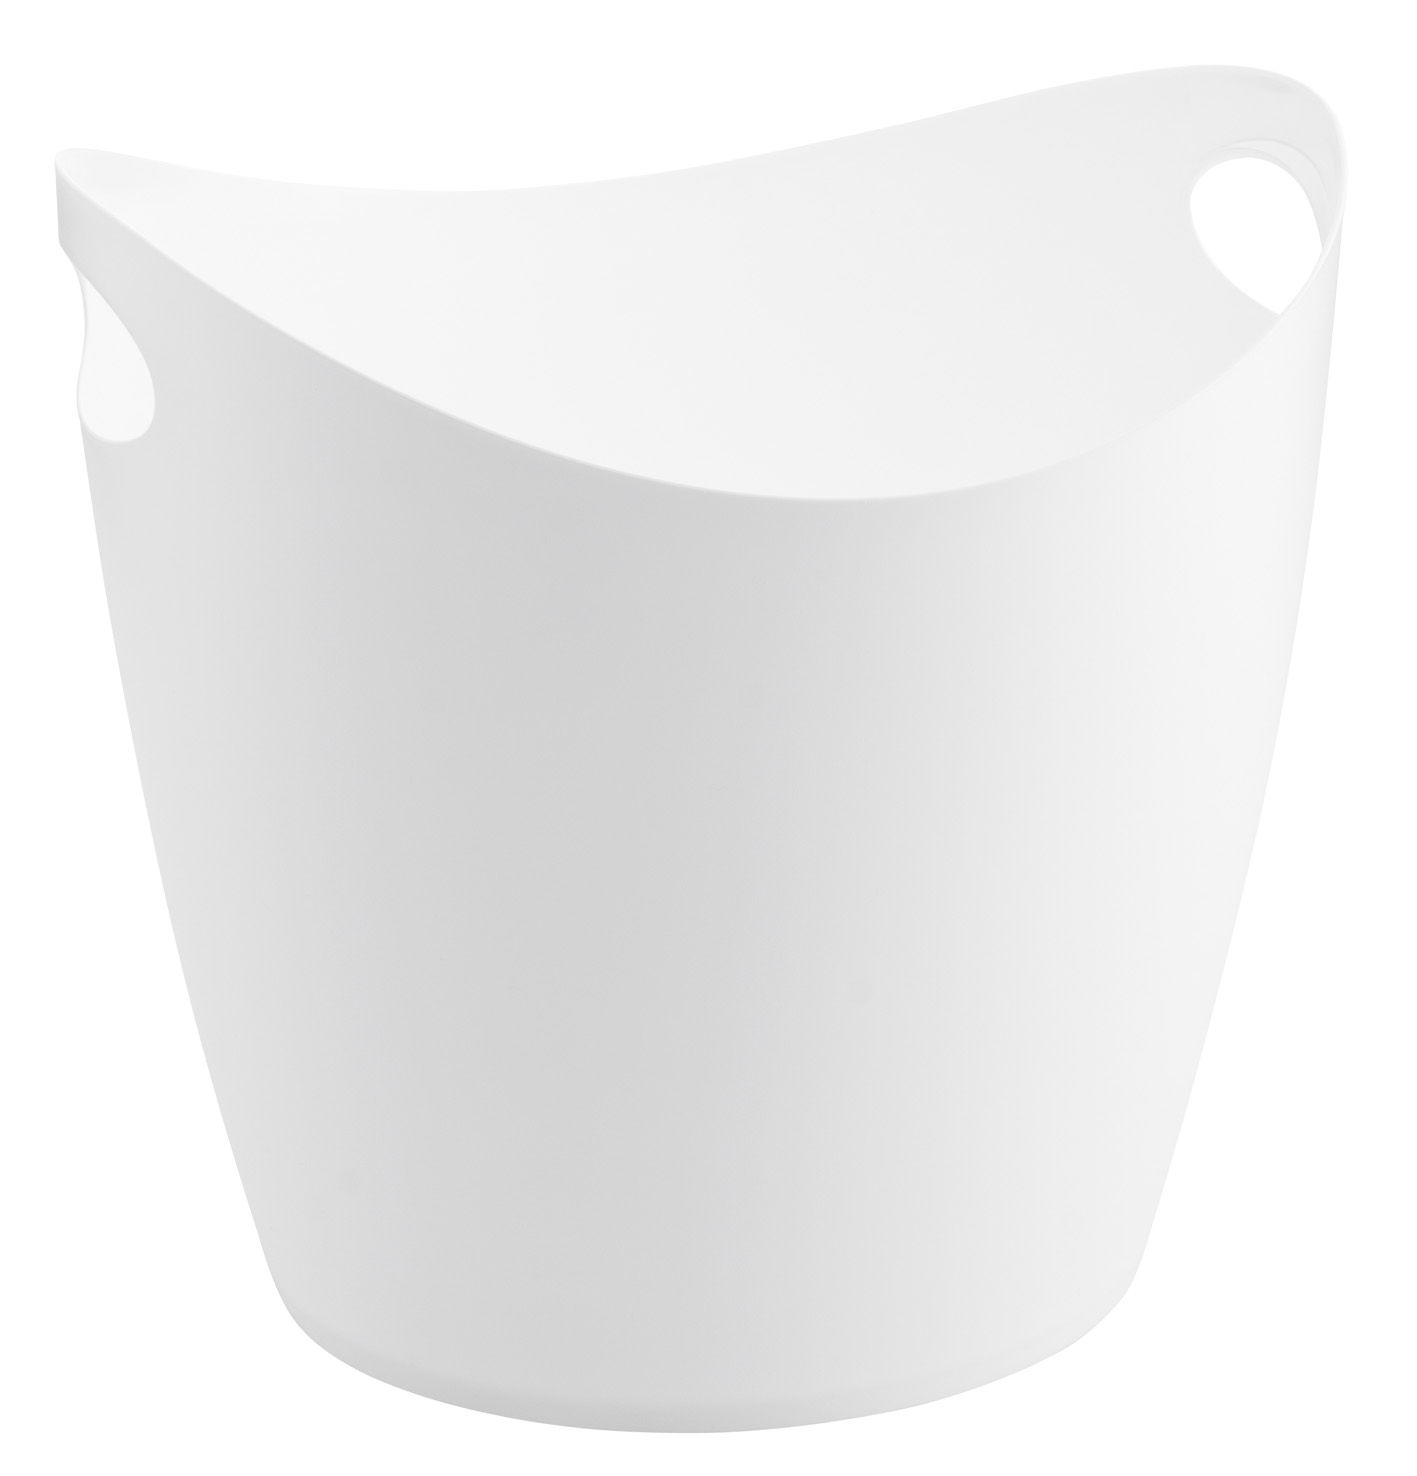 Decoration - For bathroom - Bottichelli XL Basket - L 44 x H 40 cm by Koziol - White - Polypropylene